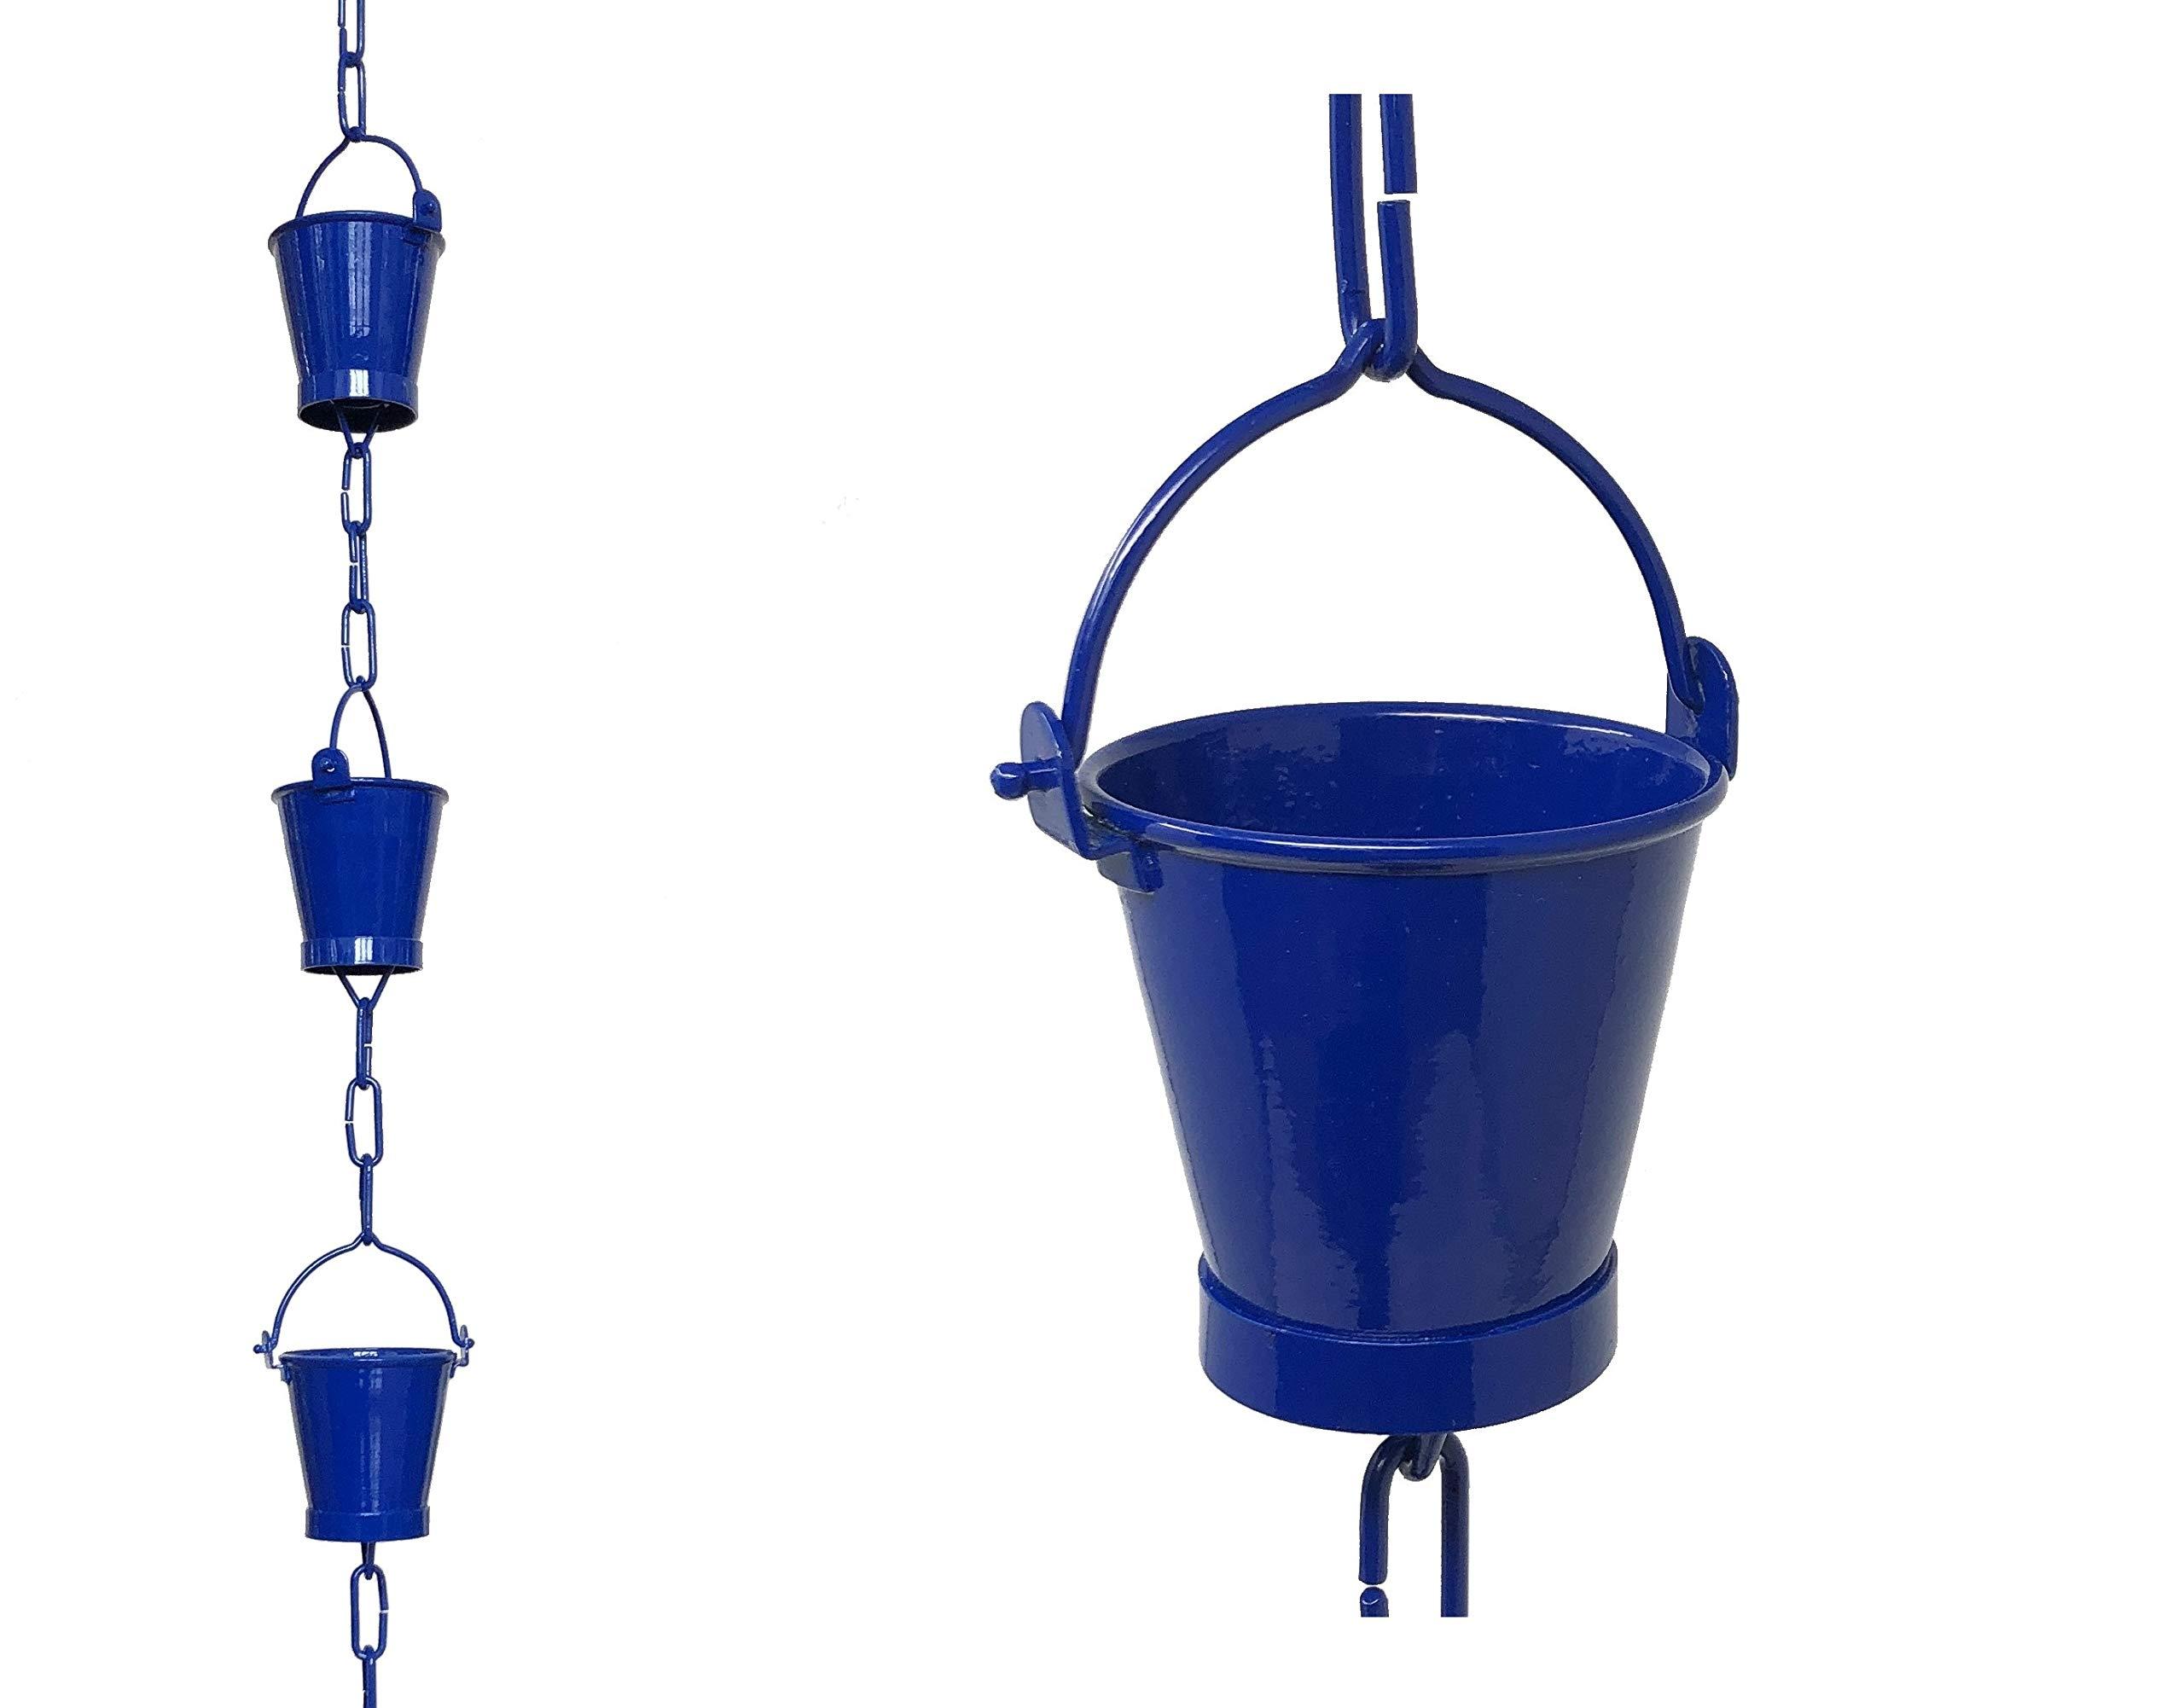 U-nitt 8.5 ft Rain Chain for Gutter: Bucket Cup; Blue Powder Coated Aluminum #8146BLU